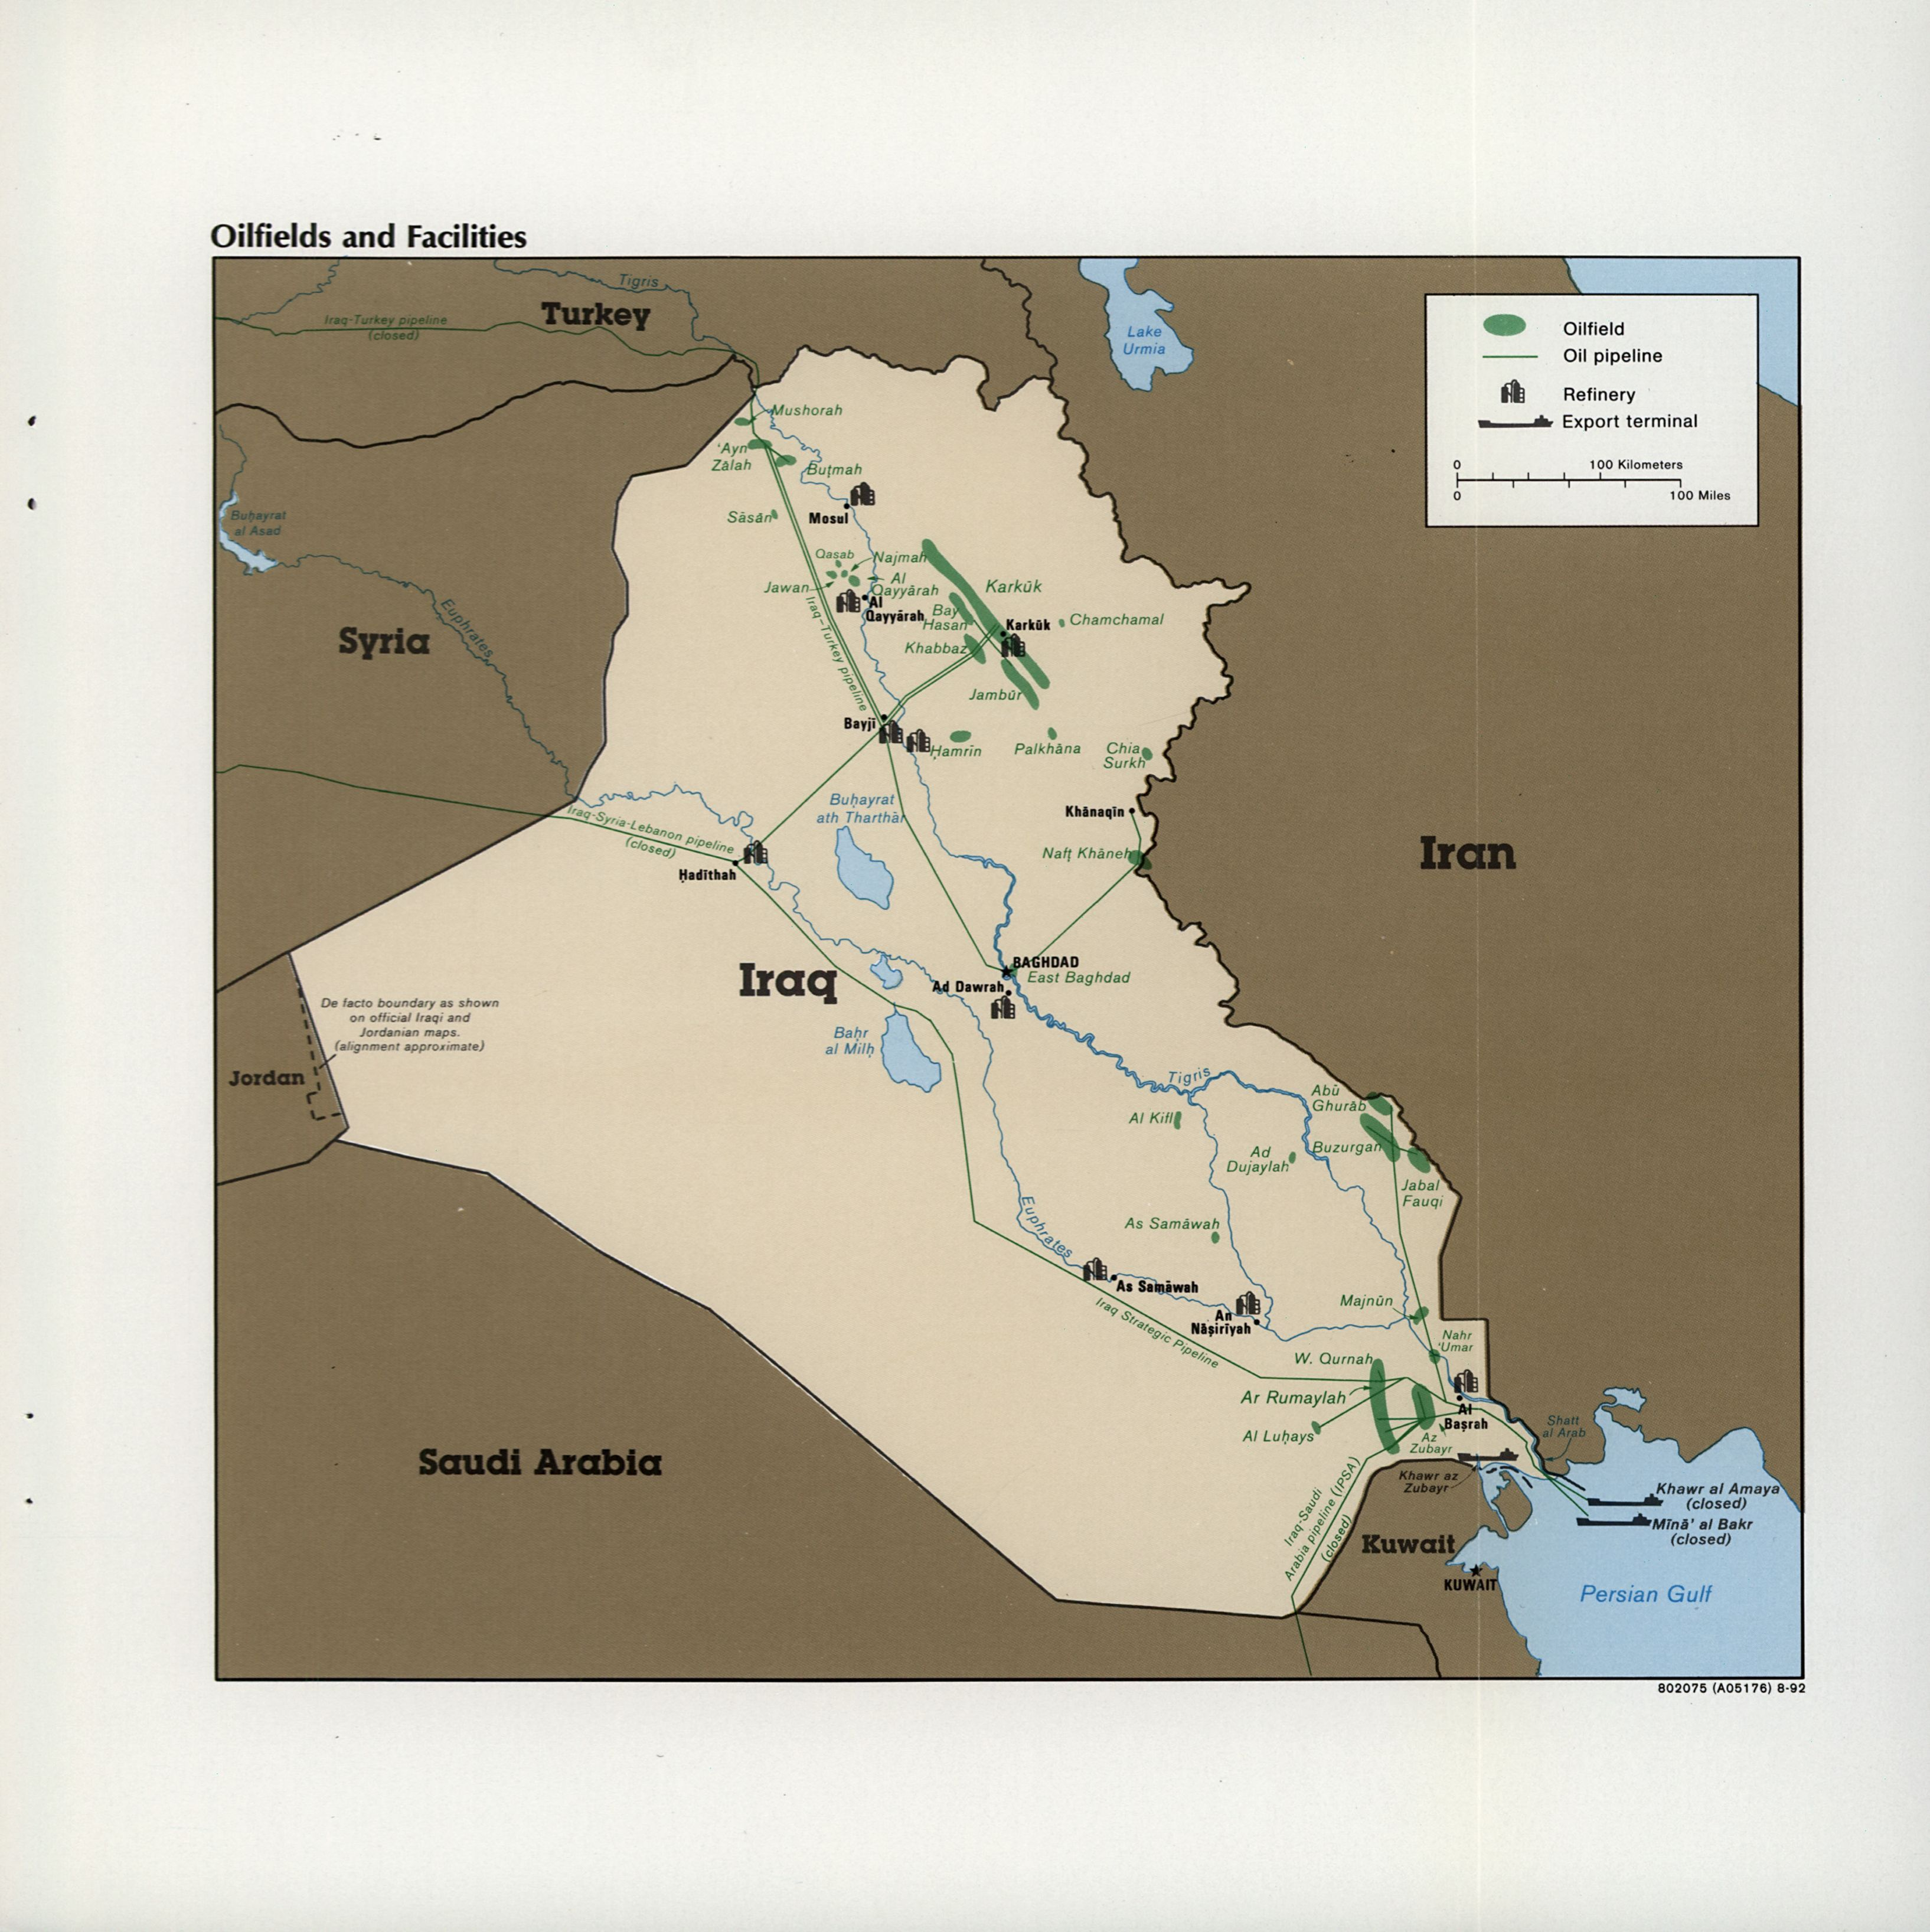 File:Iraq - a map folio LOC 93676132-8.jpg - Wikimedia Commons